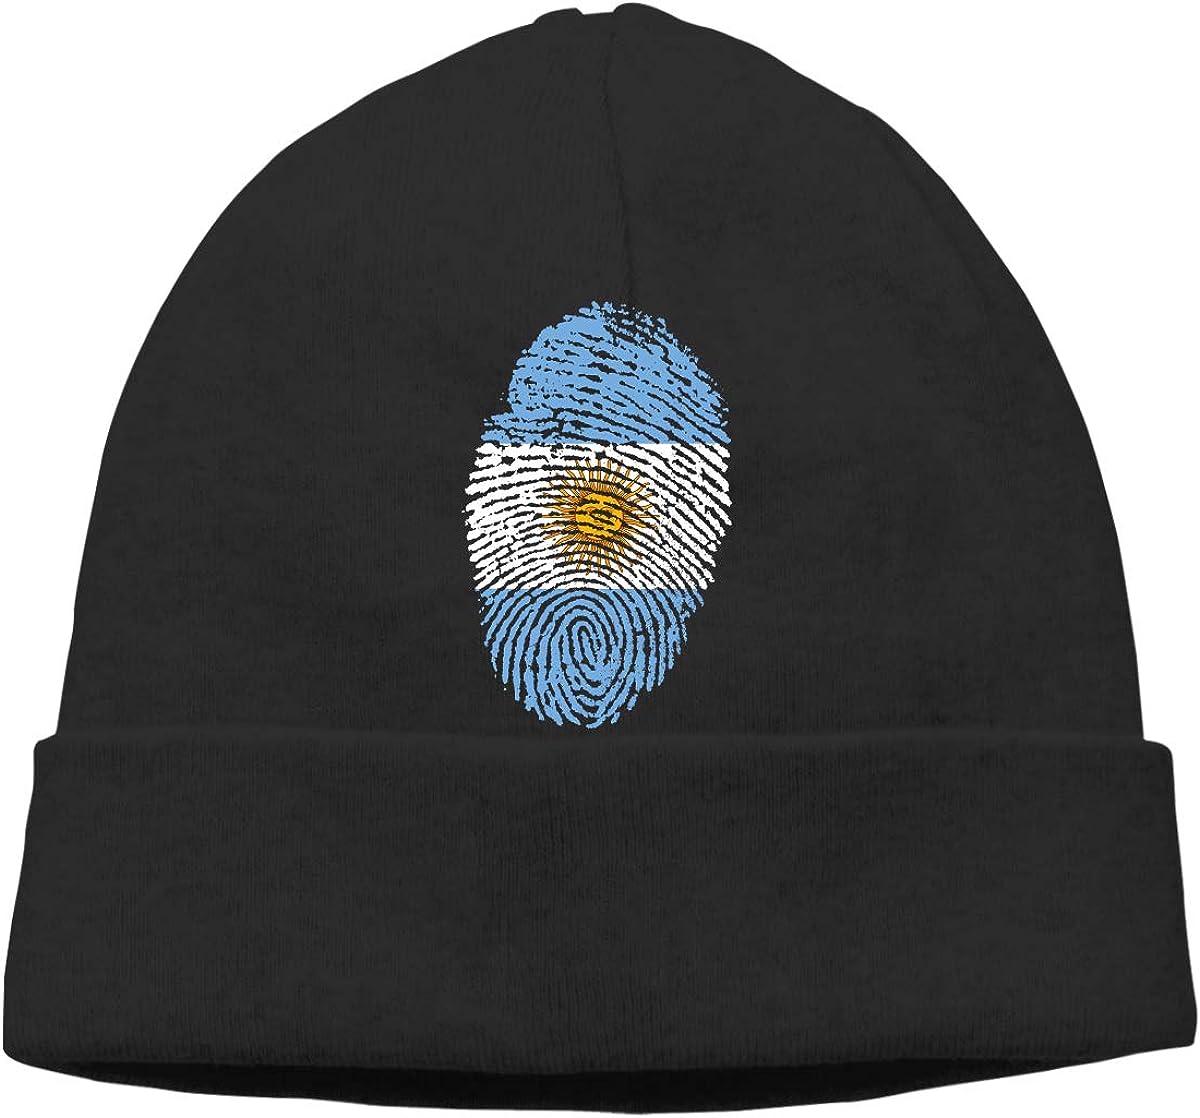 Argentina Unisex Cuffed Plain Skull Knitted Hat Beanie Cap Men Women Black